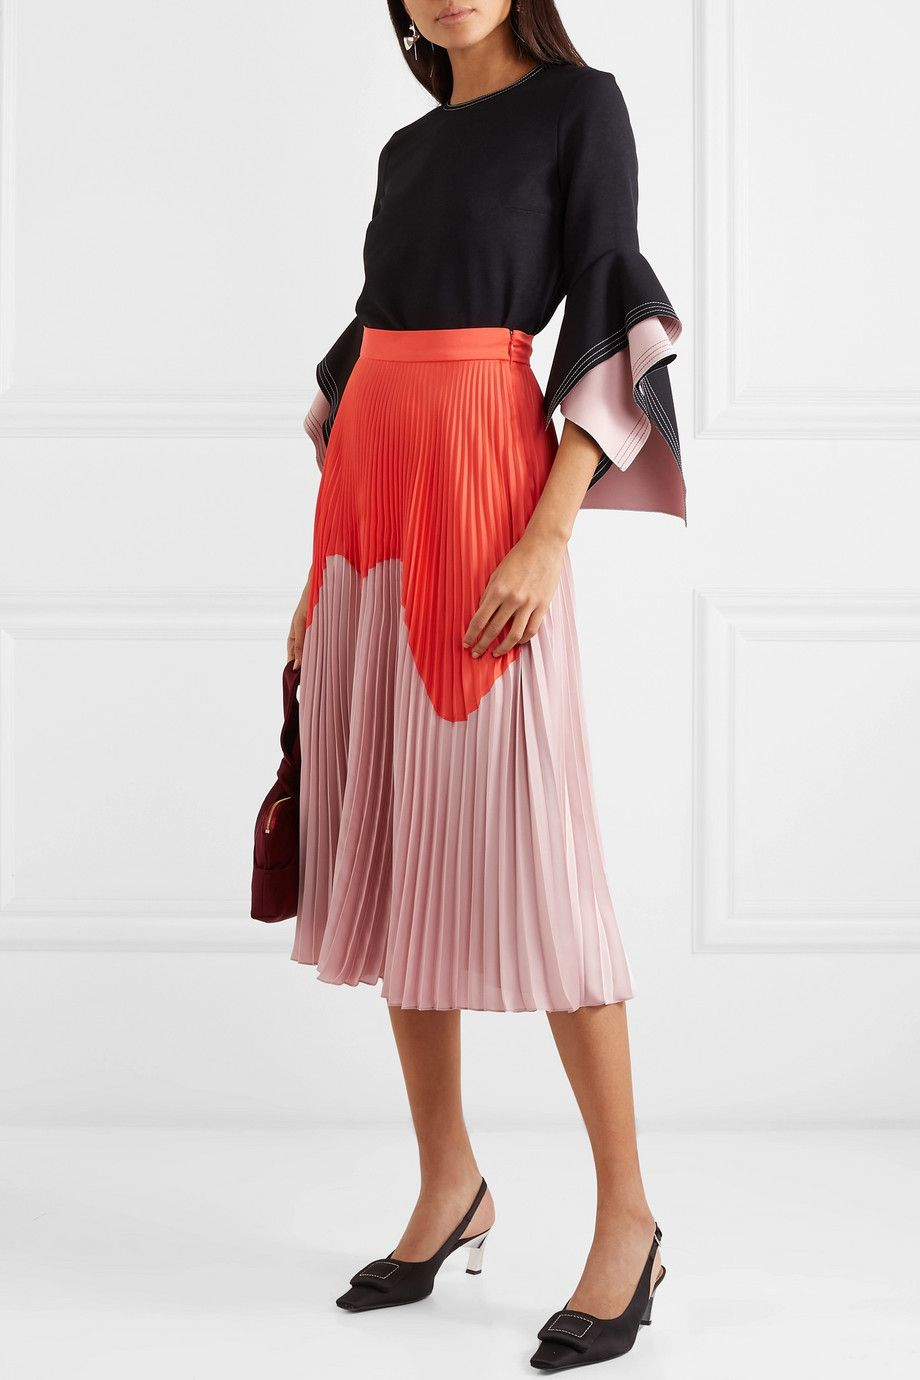 c47b63a20 Proljetno lice plisirane suknje i njeni najbolji modeli za novu sezonu  Satin Midi Skirt